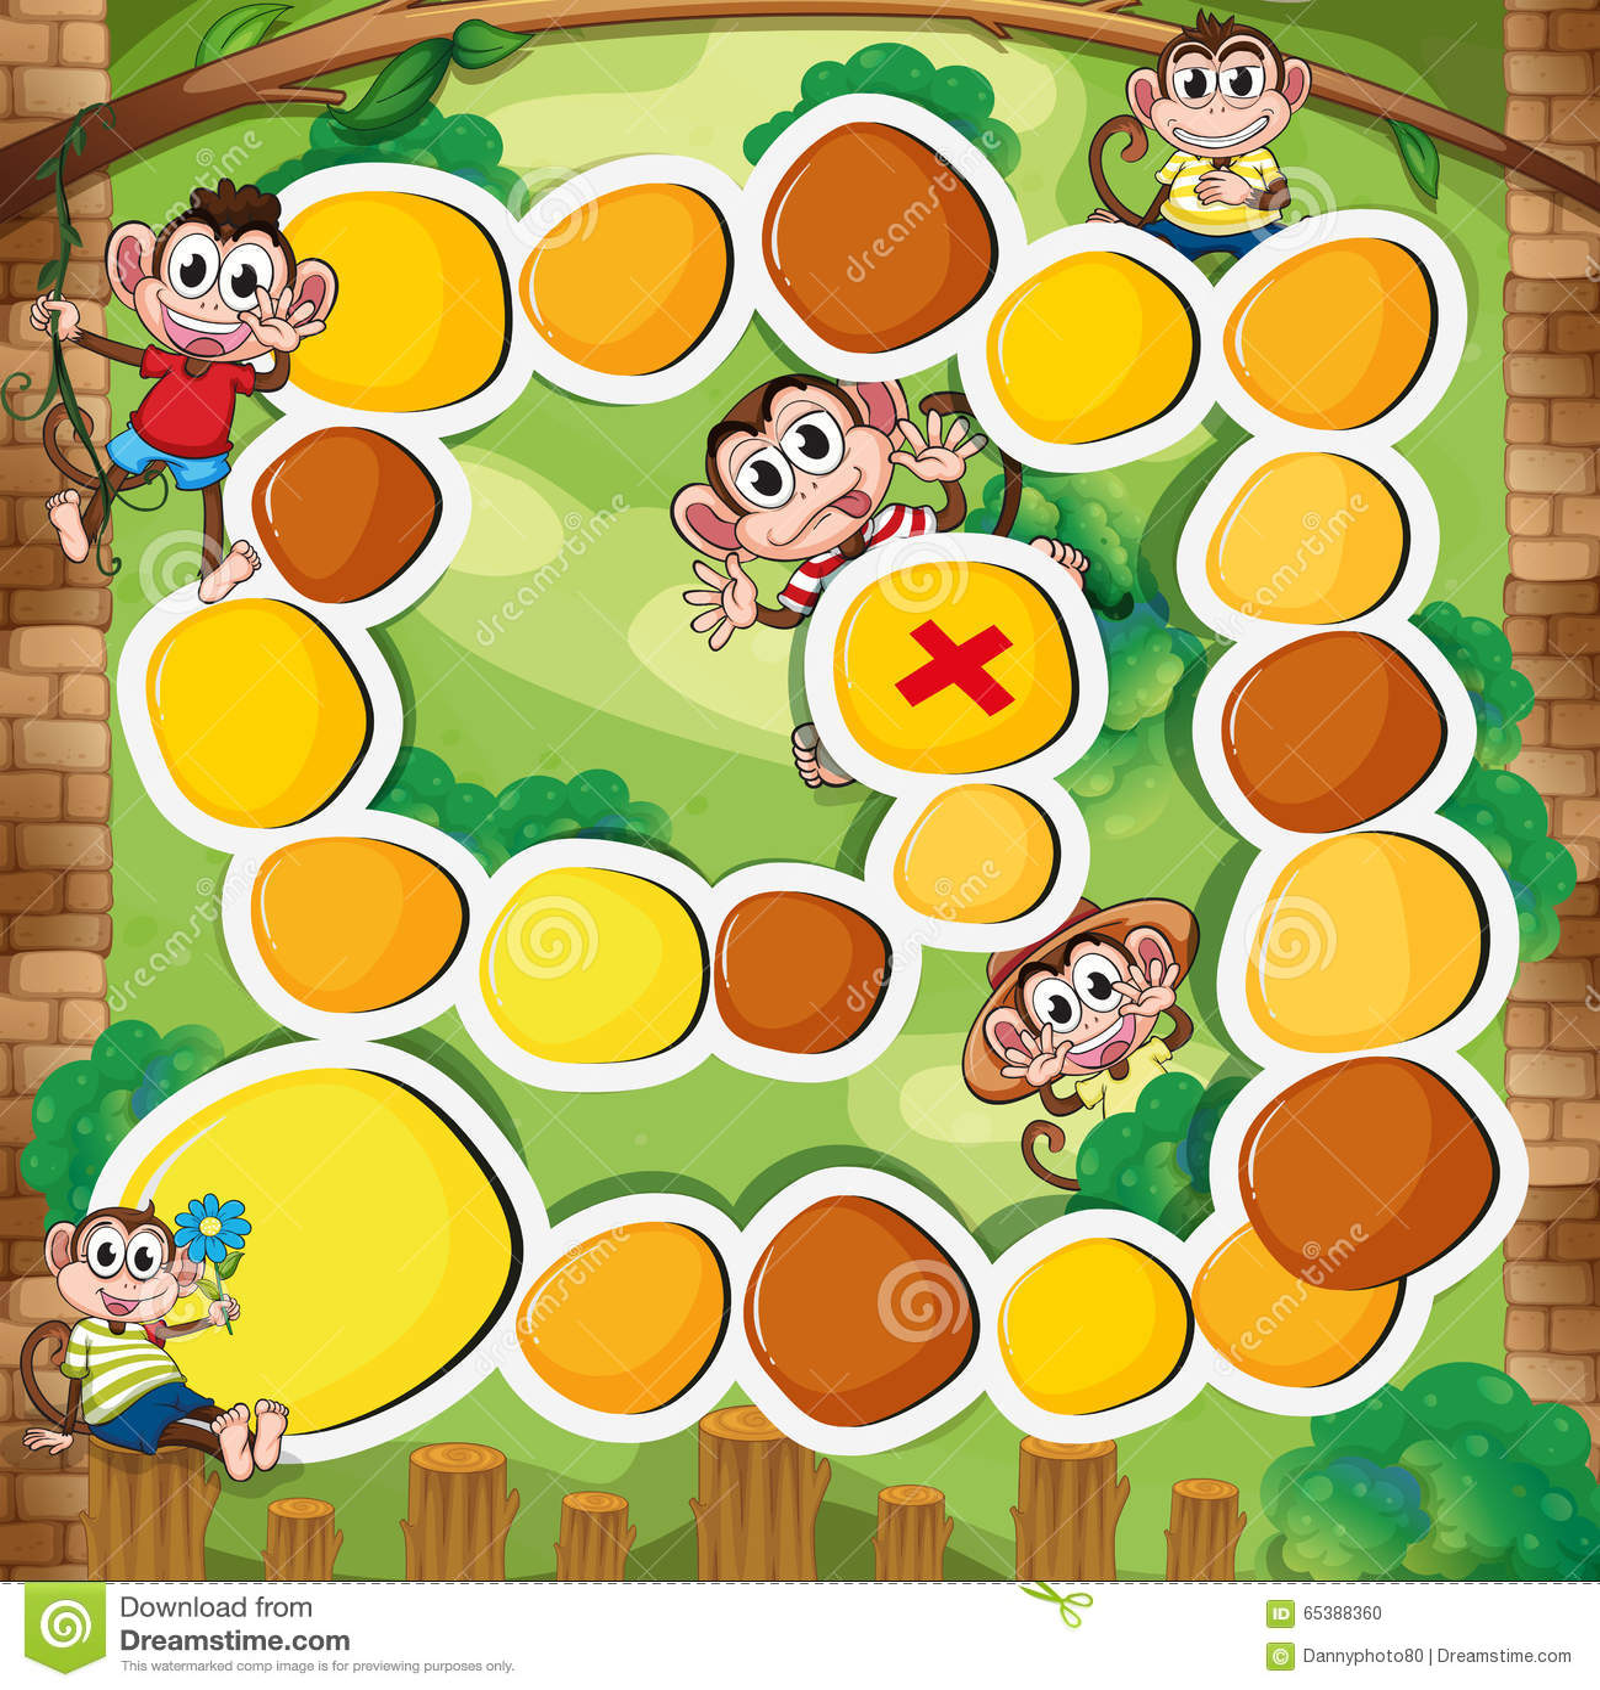 affen game